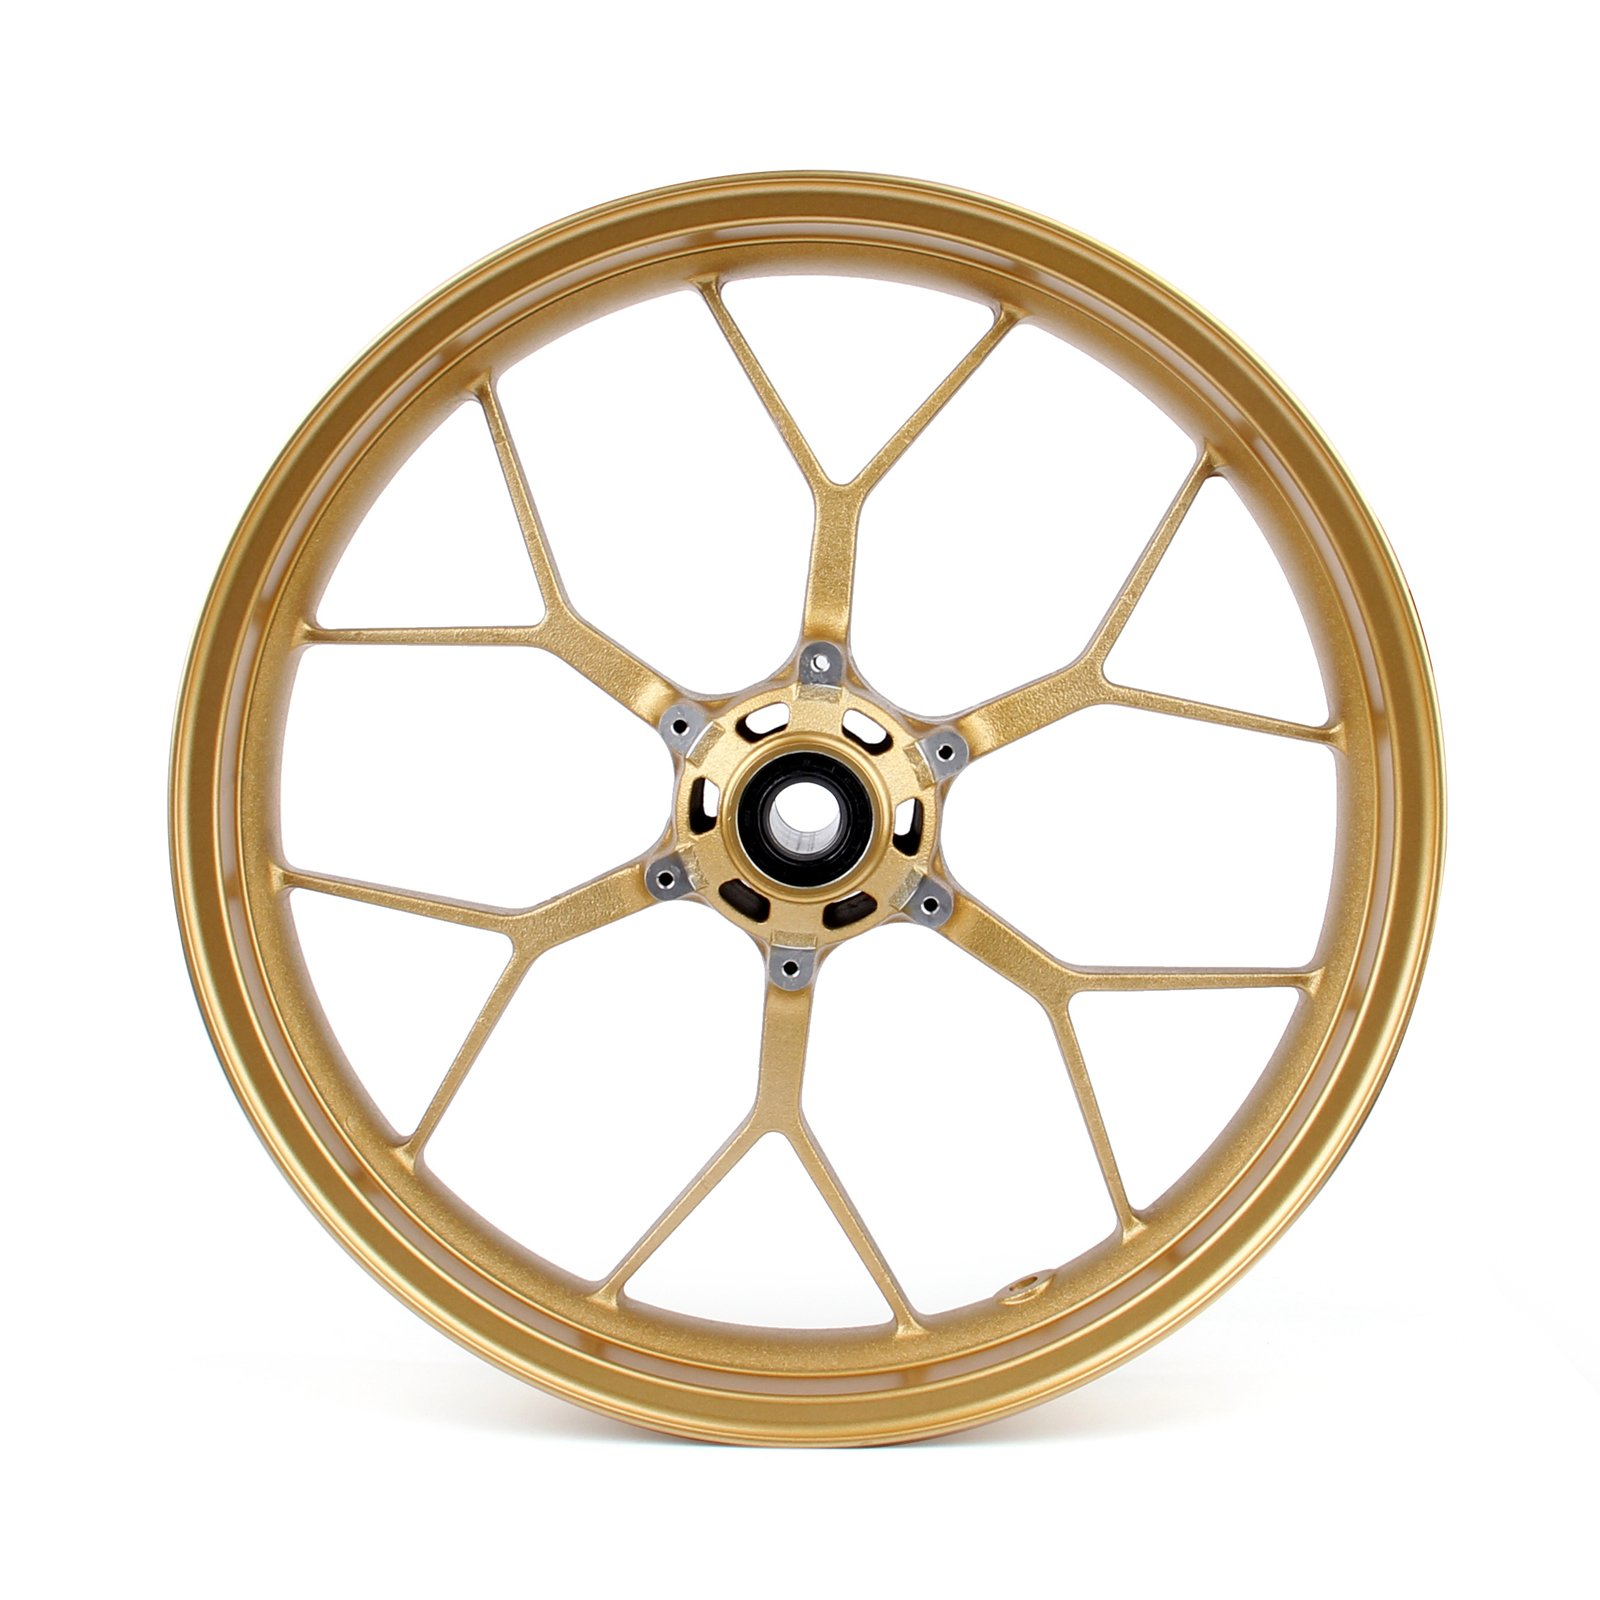 Areyourshop Front Wheel Rim For Honda CBR1000RR CBR 1000RR 2008-2014 Gold by Areyourshop (Image #1)